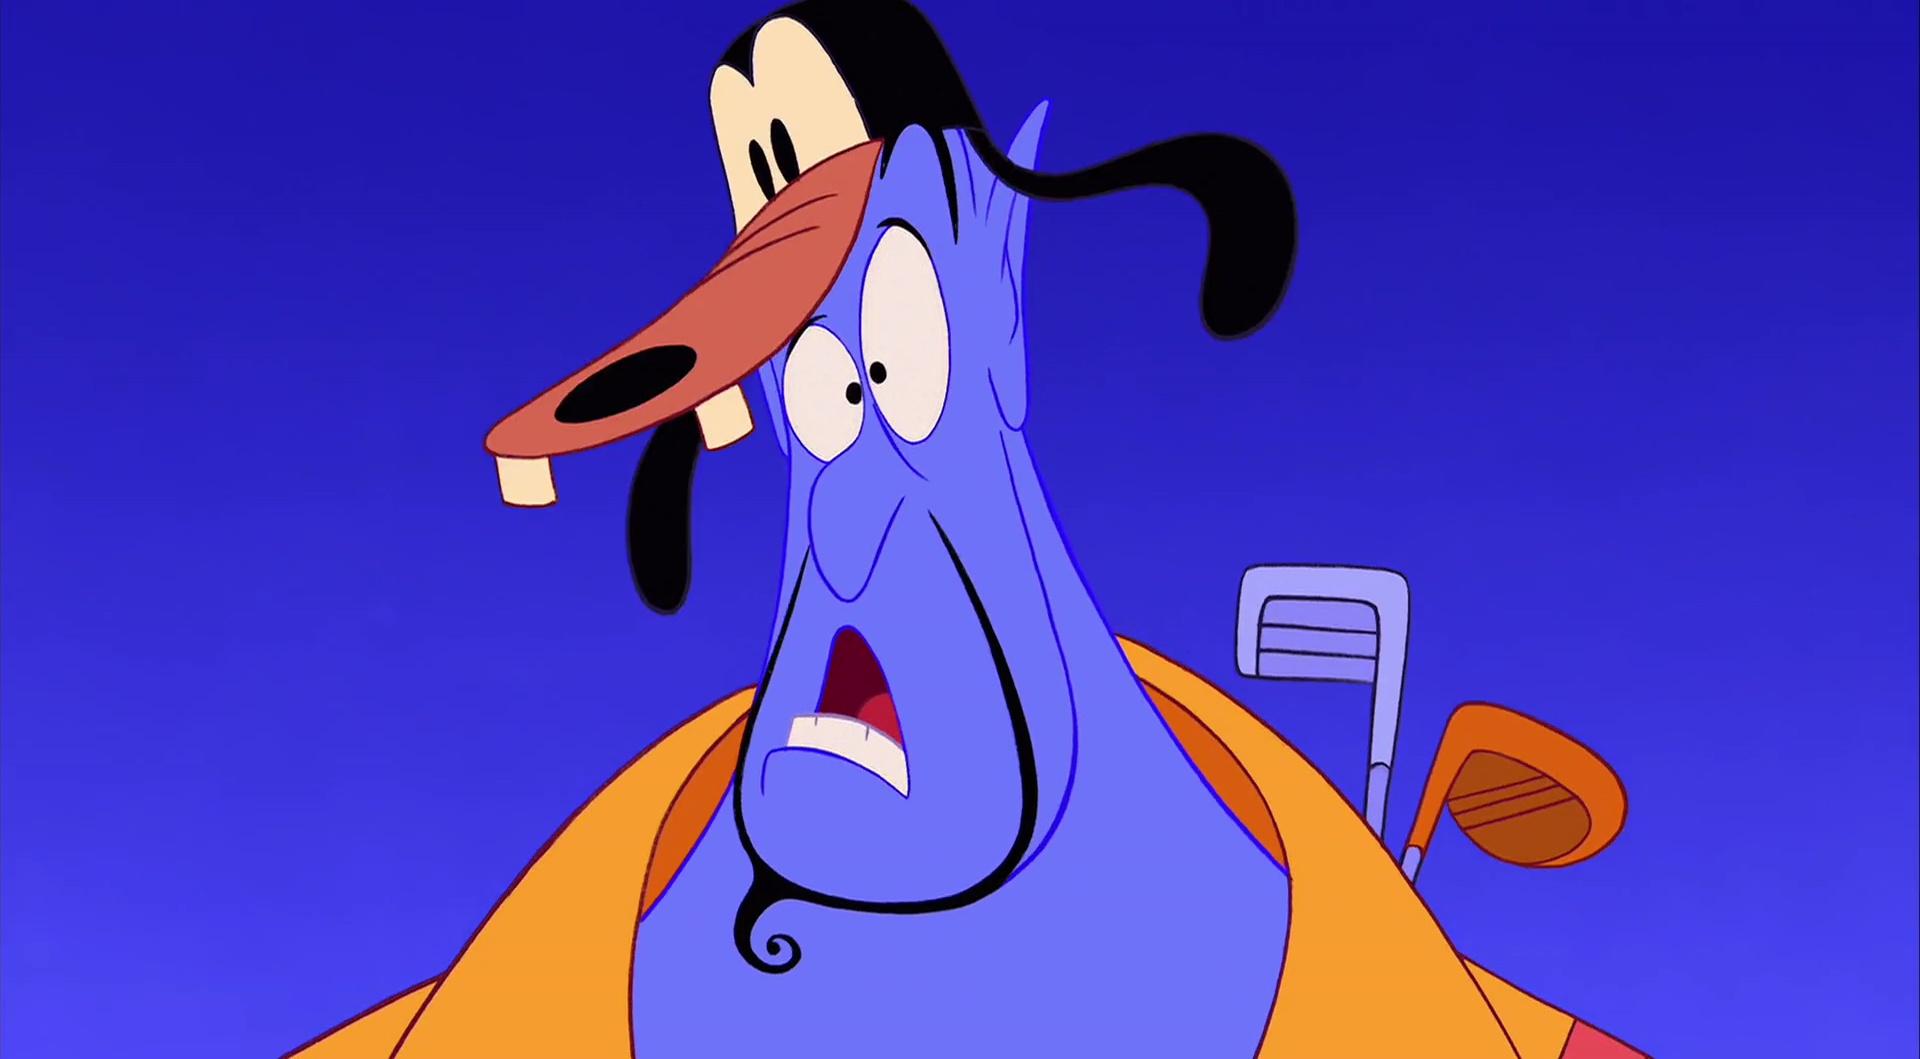 genie personnage character disney animation aladdin